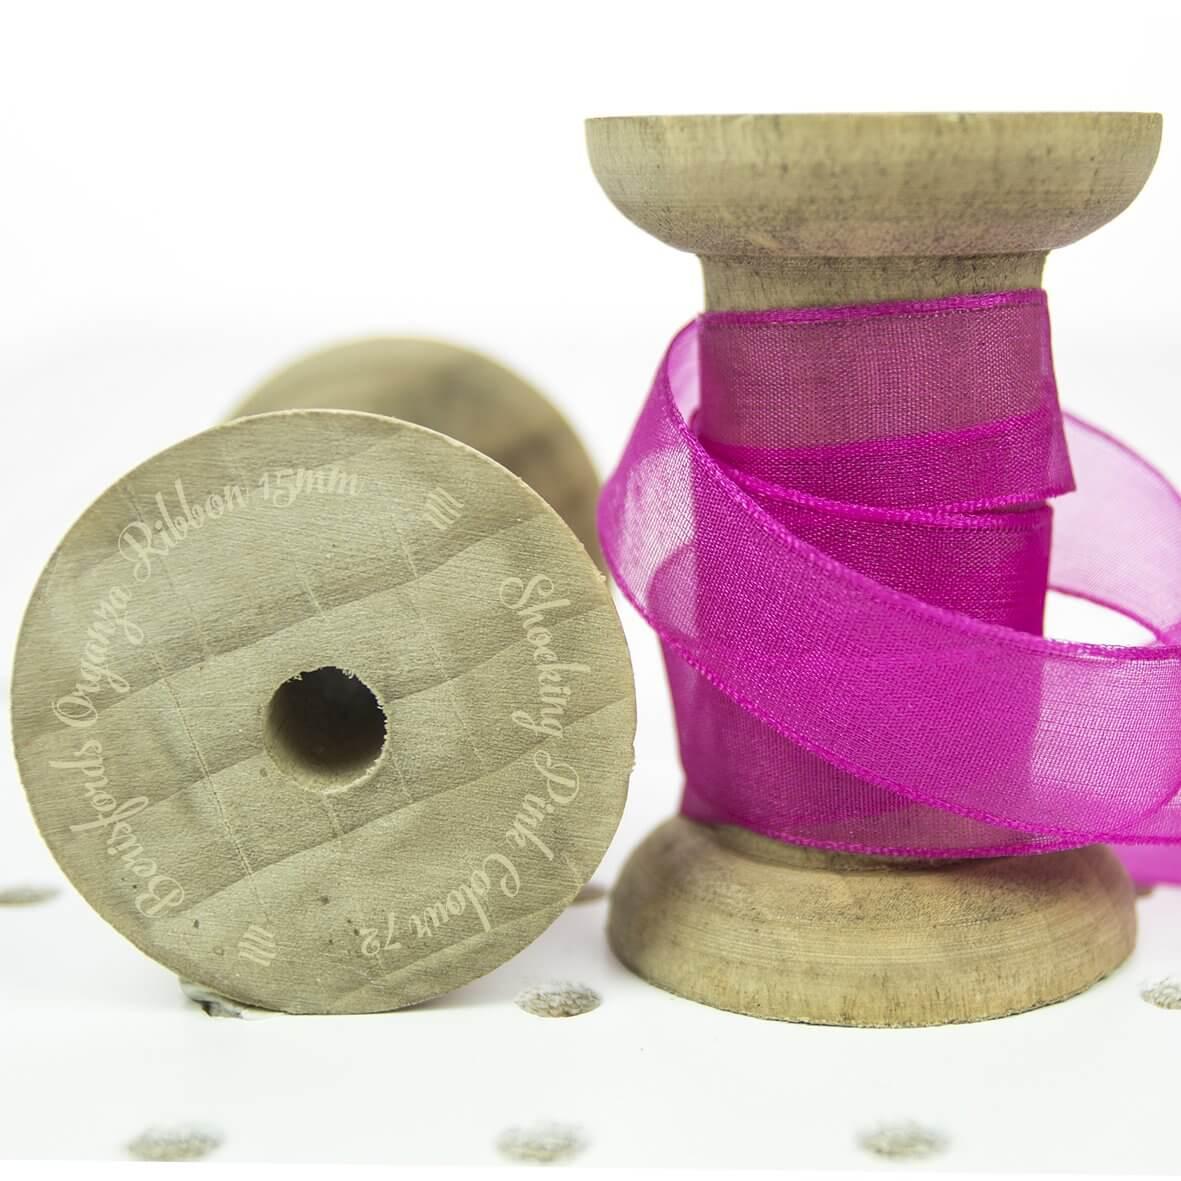 Berisfords Sheer Organza Ribbon 15mm - Shocking Pink Fuschia Colour 72 - Display Reel